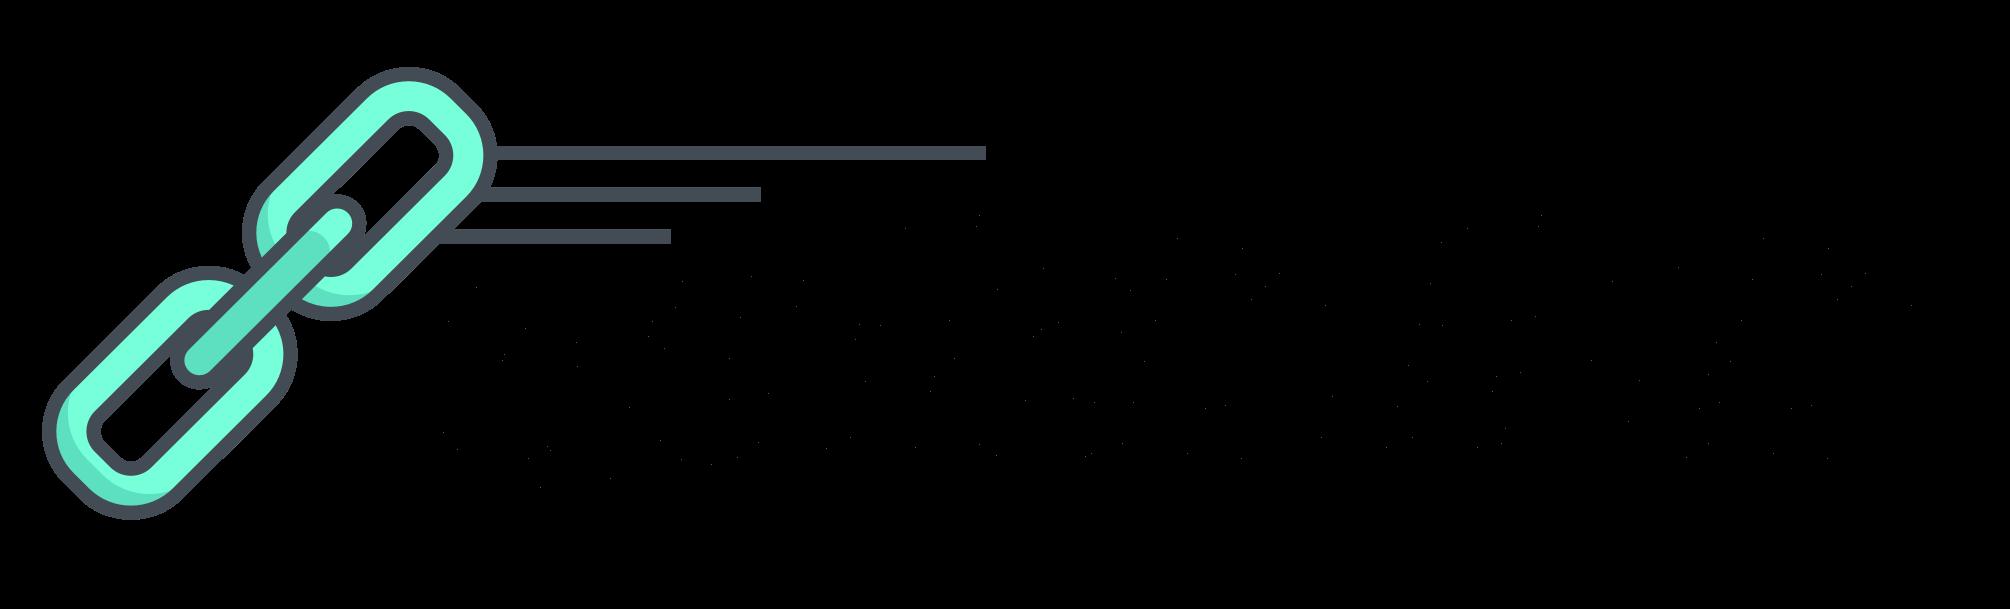 quicklink chrome extension